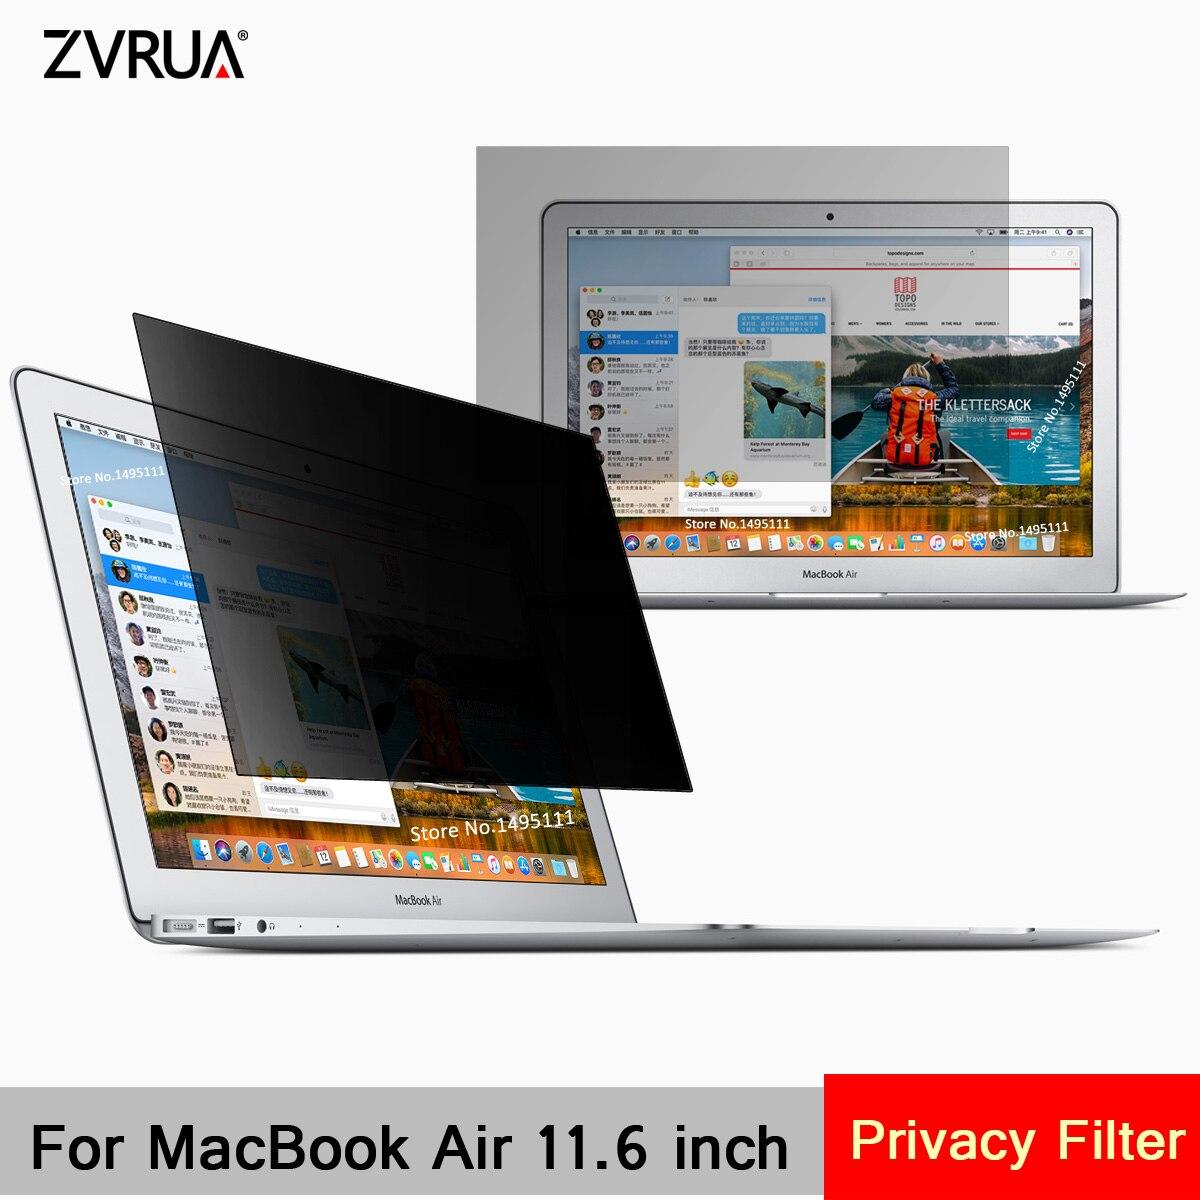 256mm * 144mm Für Apple Macbook Air 11,6 Zoll Privatsphäre Filter Laptop Notebook Anti-glare Screen Protector Schutz Film